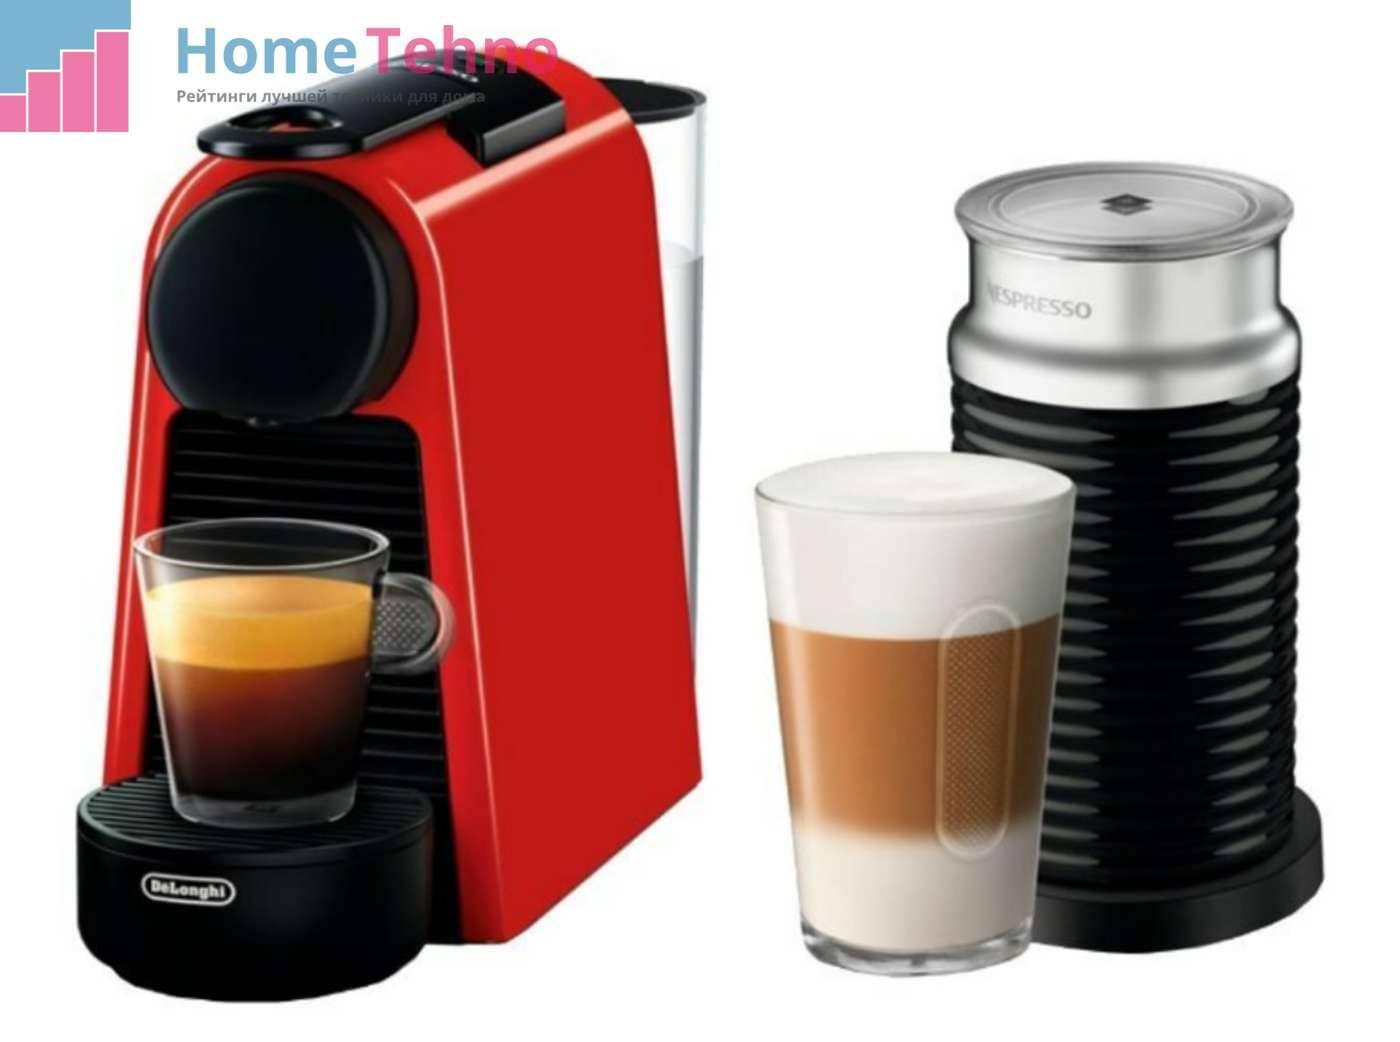 Кофемашина DeLonghi Nespresso Essenza Mini EN 85 AE